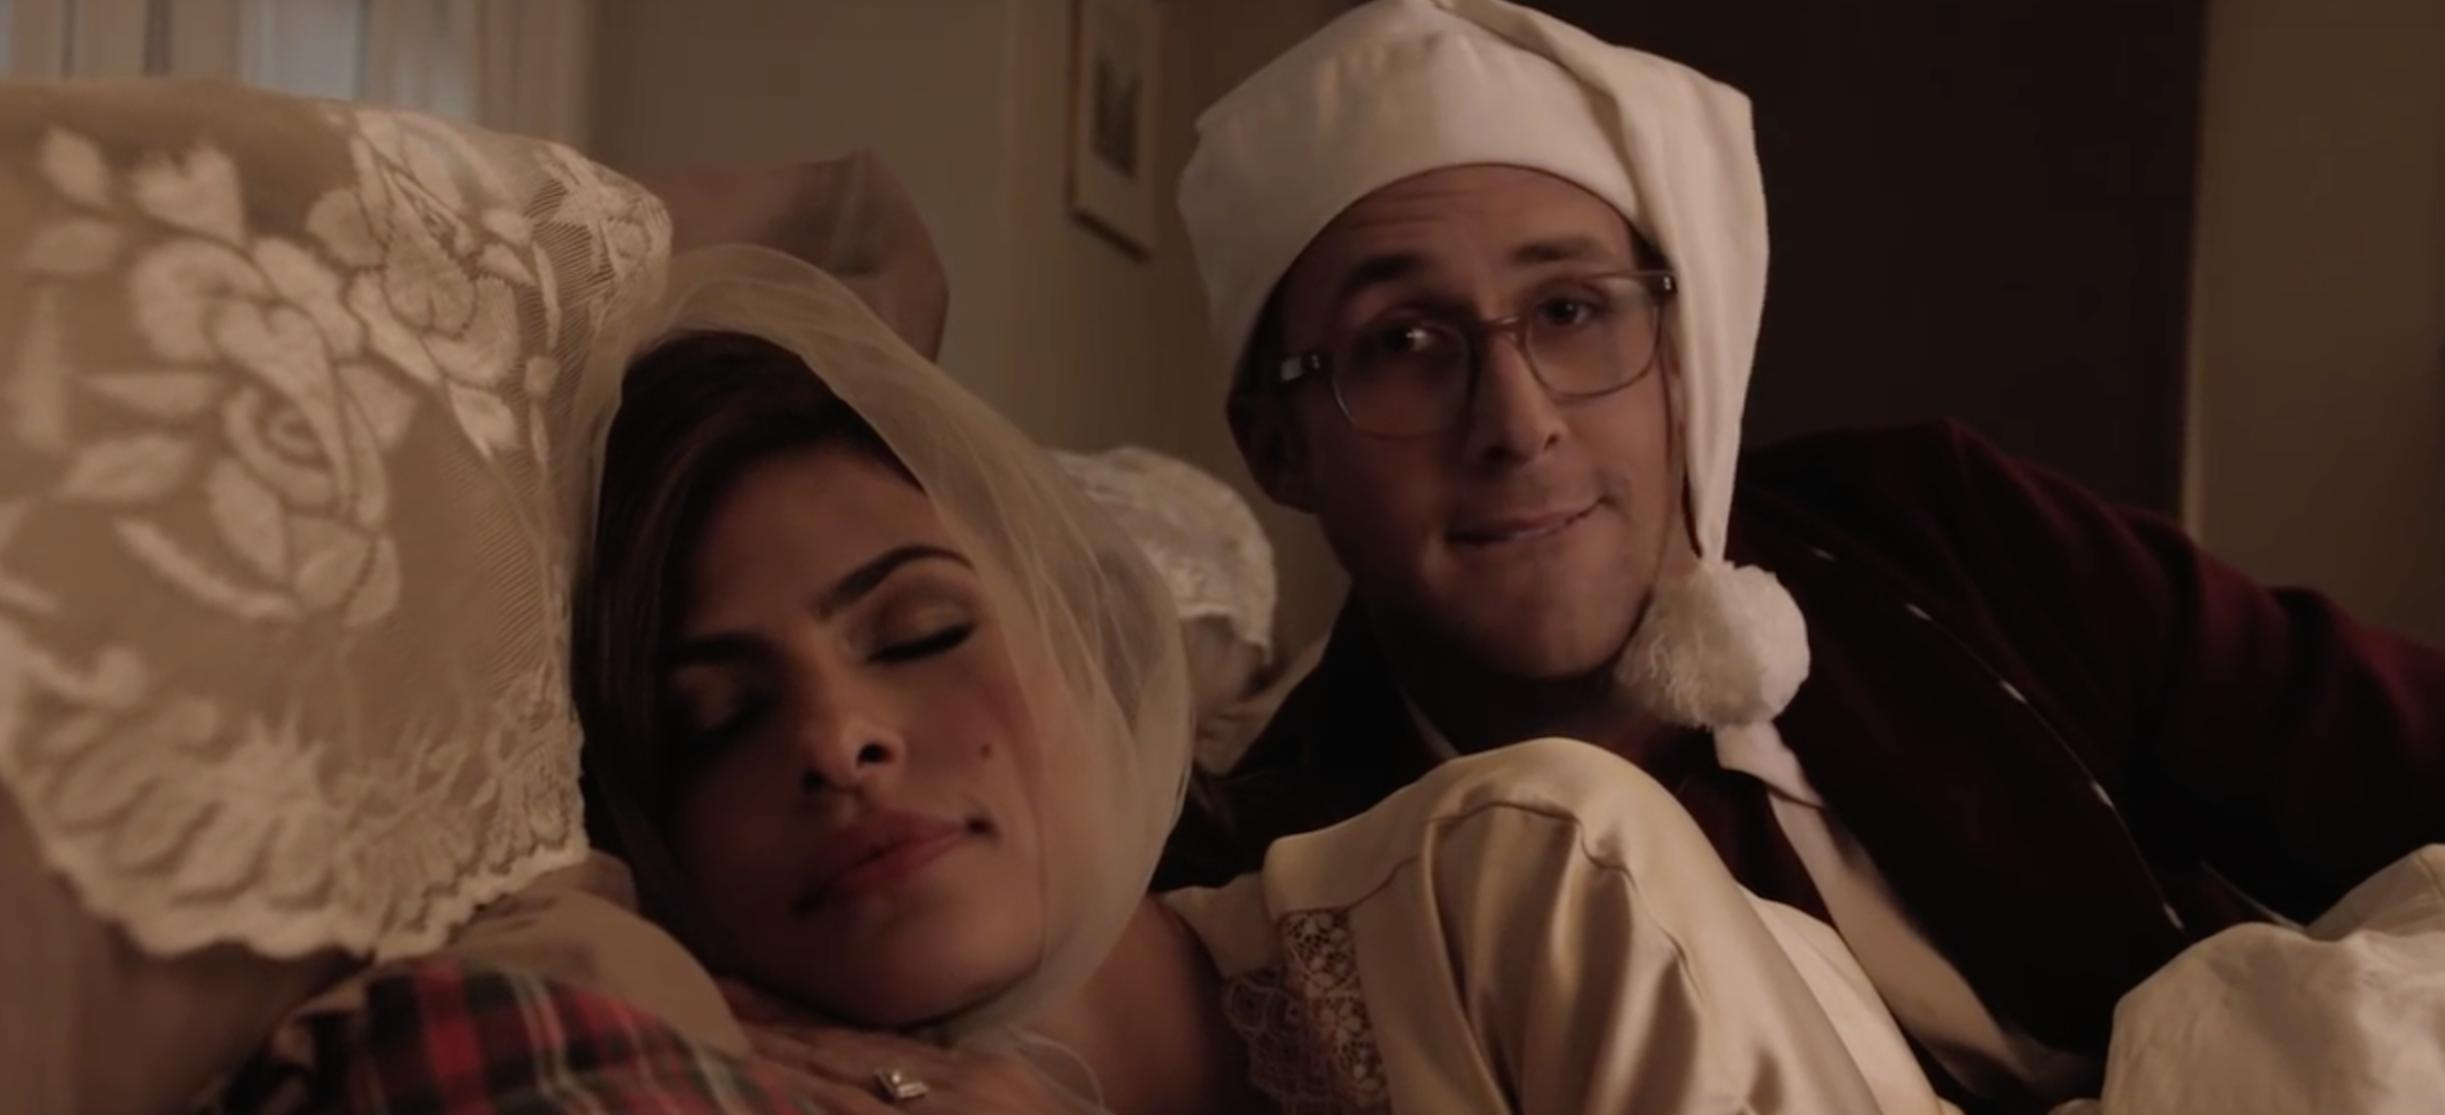 Ryan Gosling and Eva Mendes in Drunk History (2007)